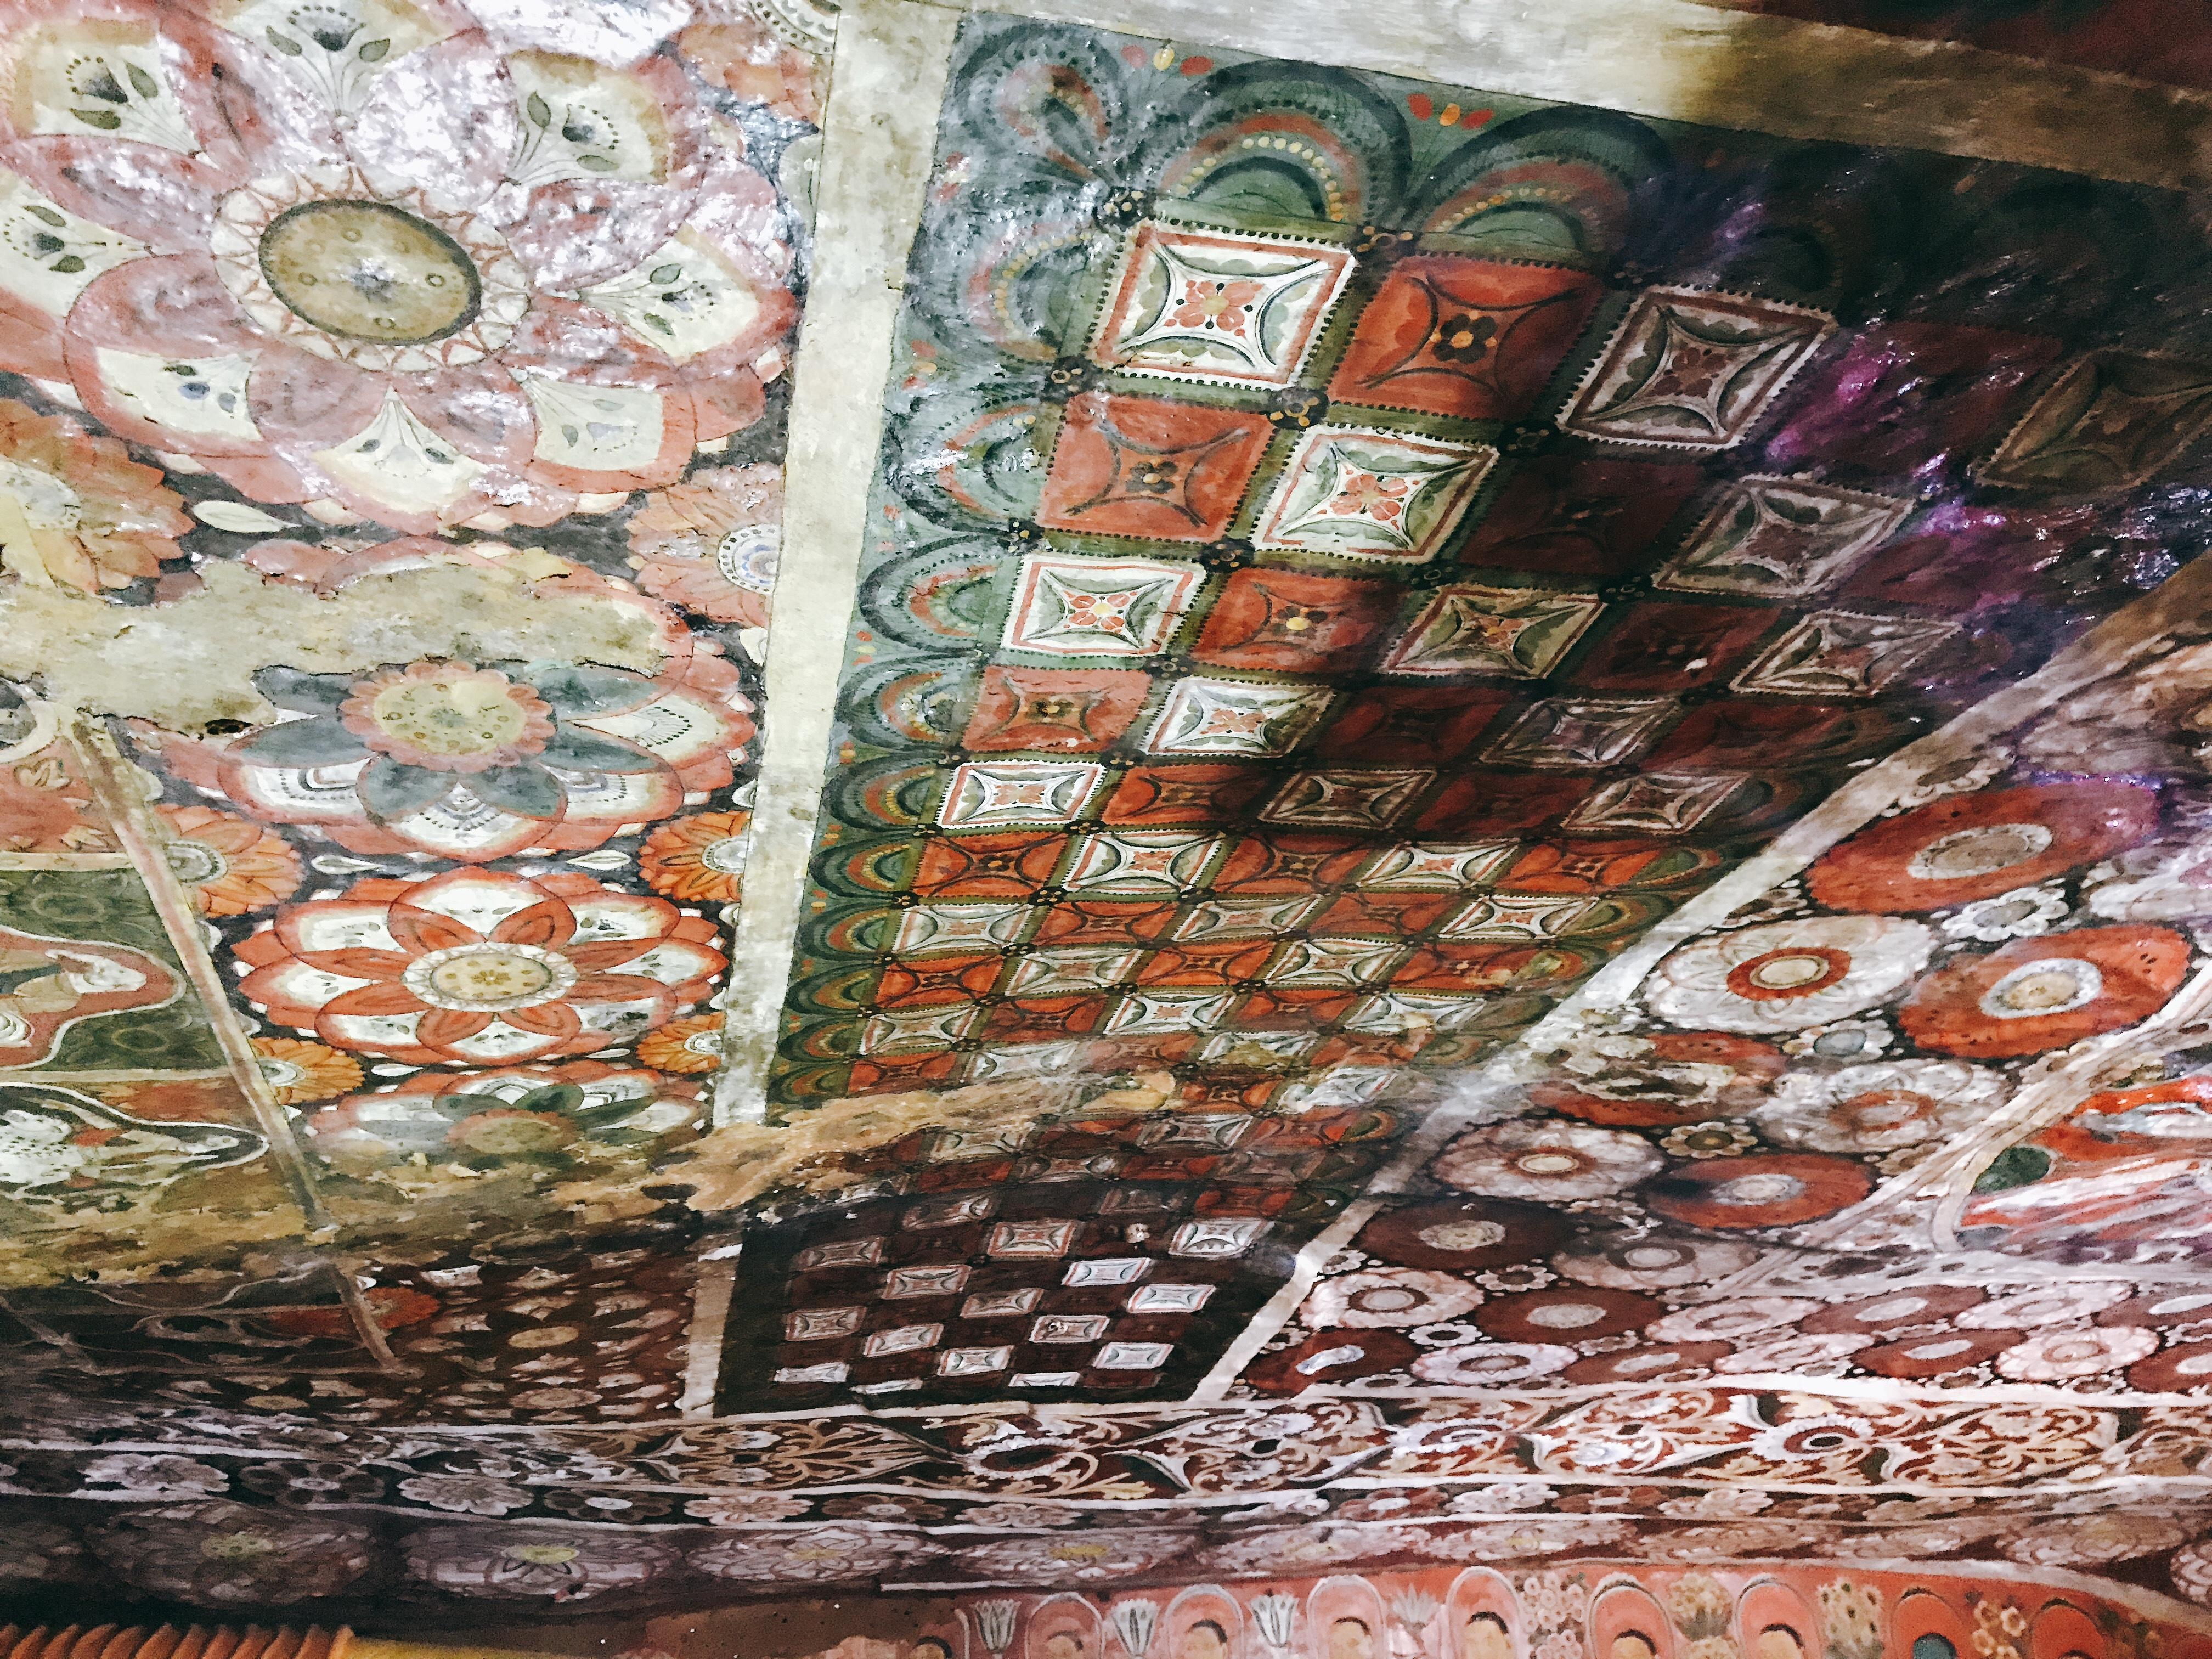 Sri Lanka Jasmine Tours & Drivers スリランカジャスミンツアーズ撮影。 マルキリガラ寺院 マルキリガラ遺跡 ムルキリガラ の天井壁画